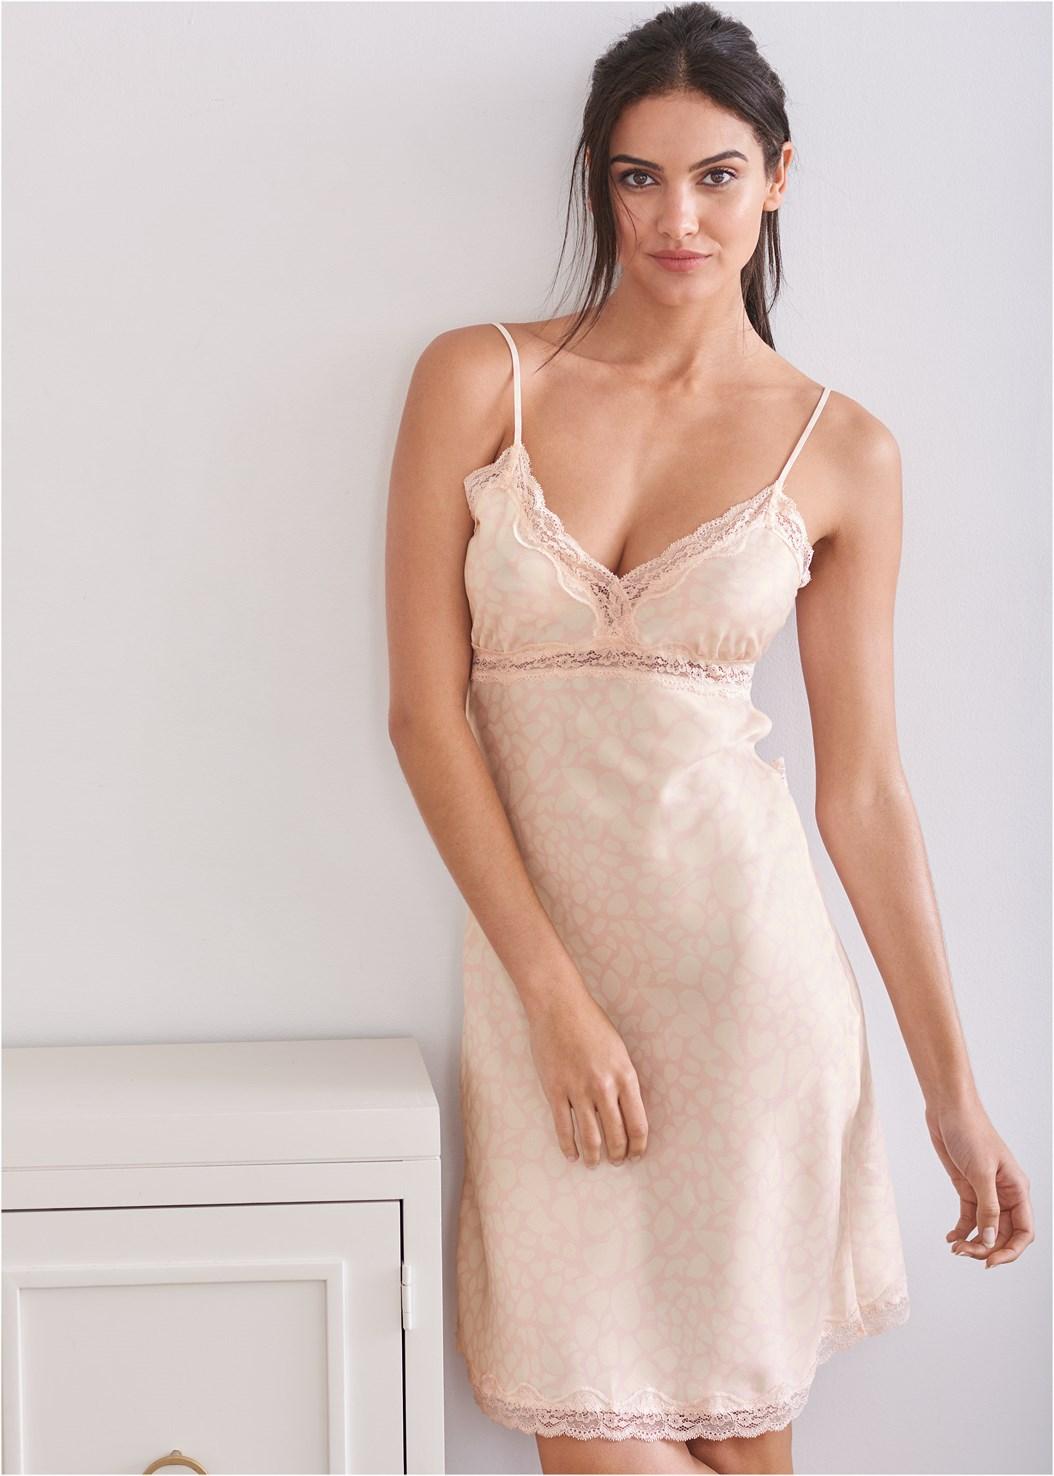 Silky Lace Sleep Dress